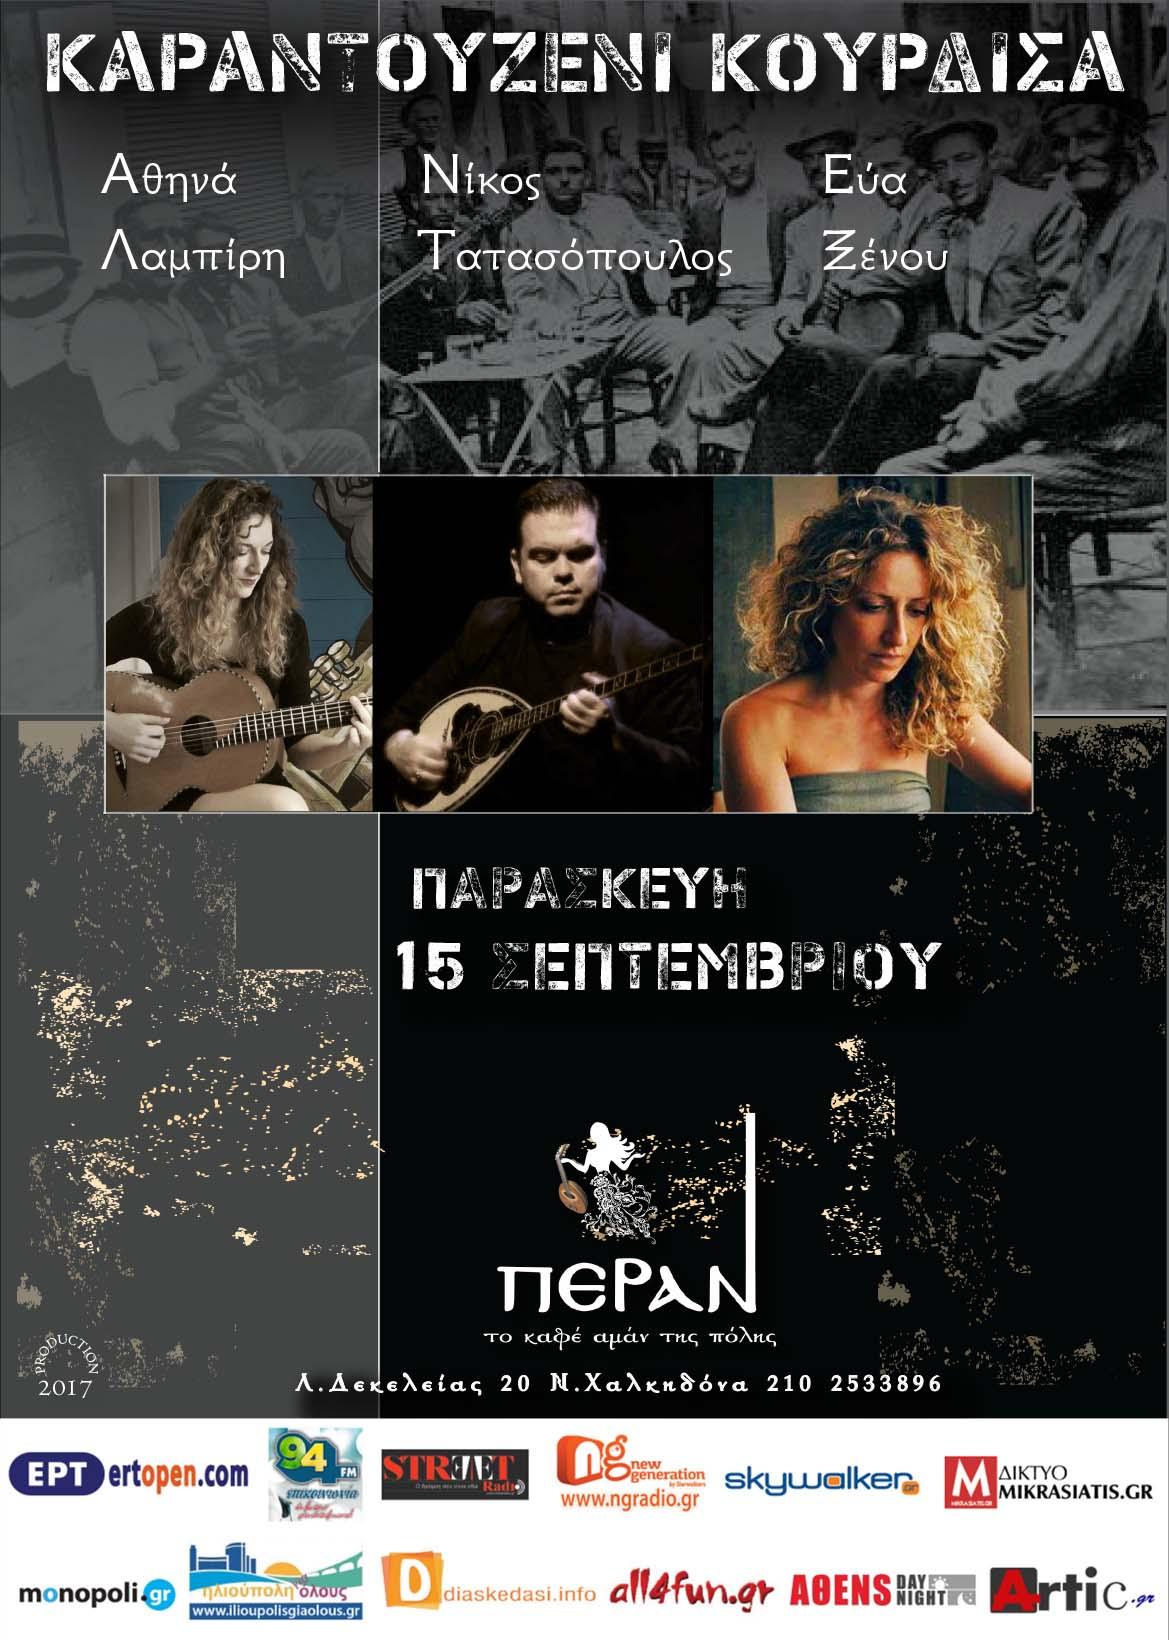 TATASOPOYLOS-XENOY 1